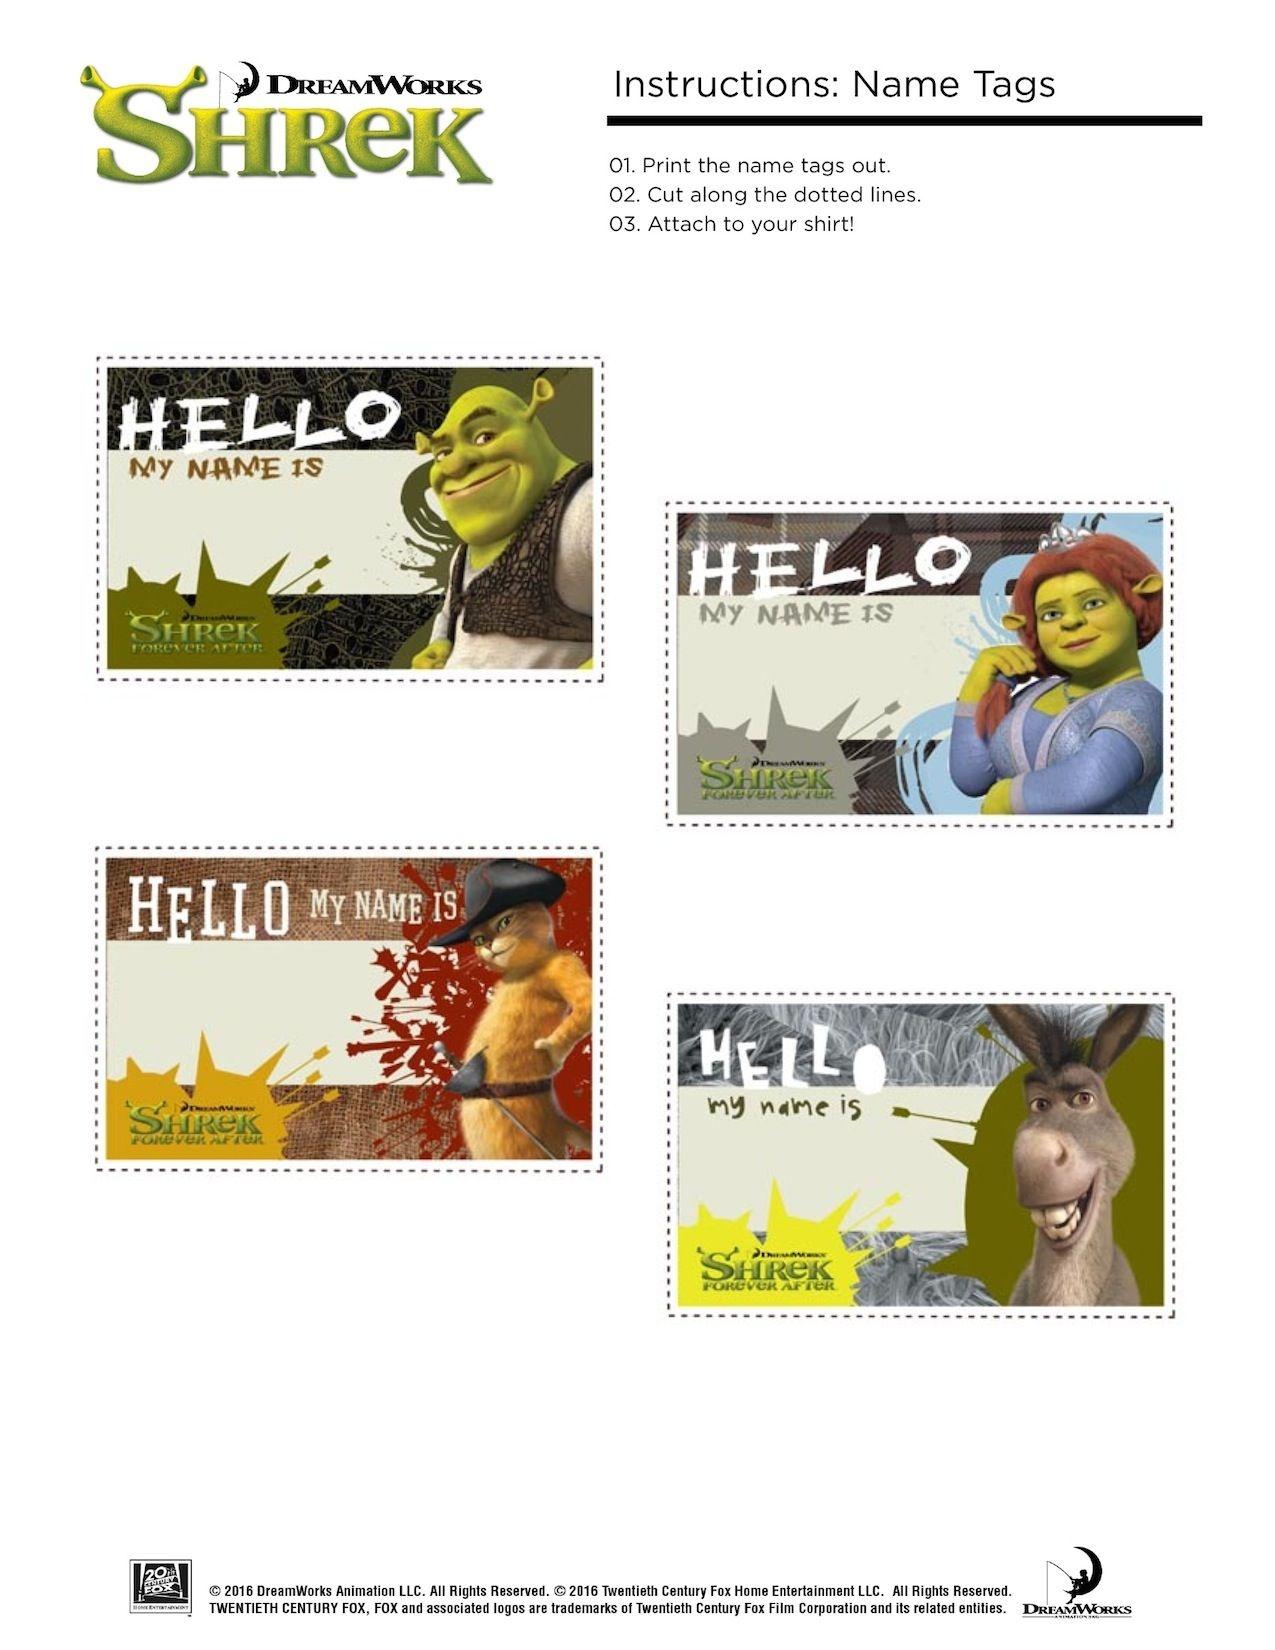 Free Printable Shrek Birthday Party: Invitation, Game, Party Hat - Free Printable Shrek Invitations